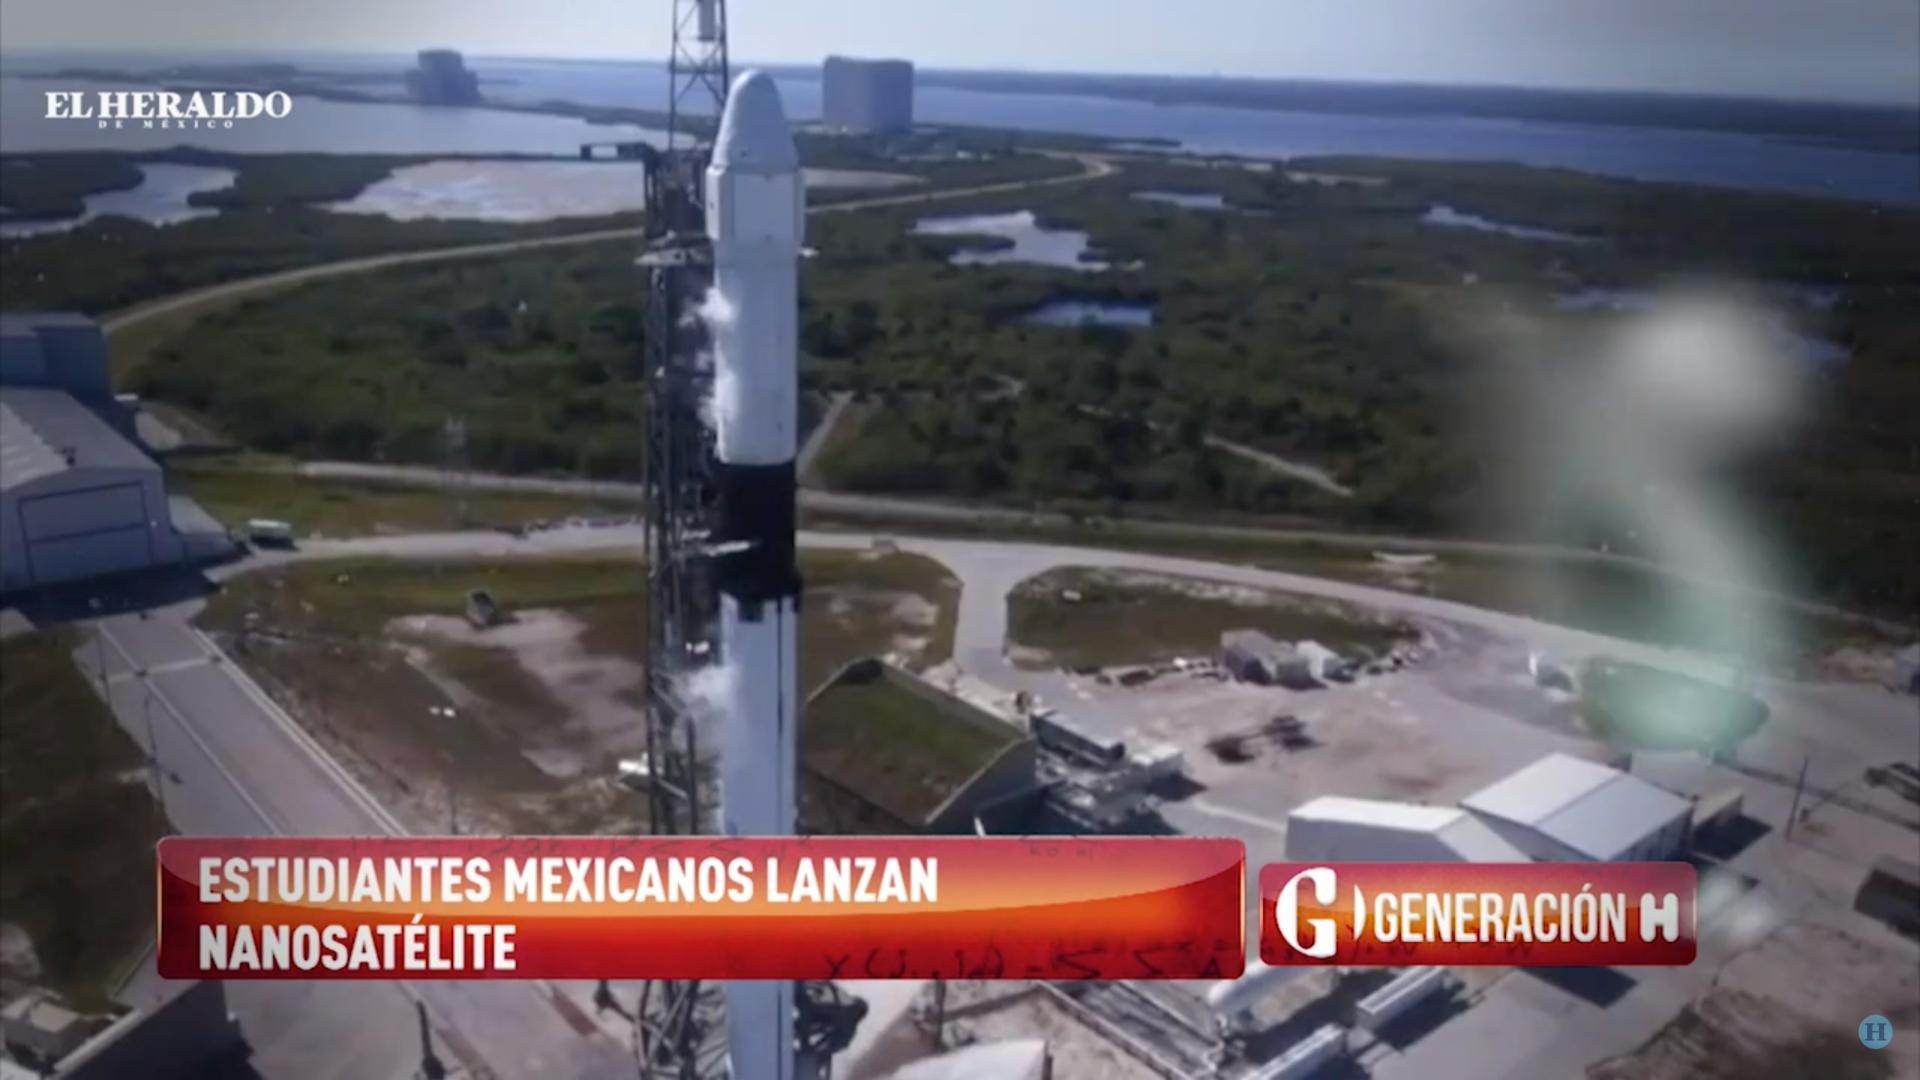 aztechsat-1-regreso-mexico-exploracion-espacial-nanosatelites-telecomunicaciones-tecnologia-espacial